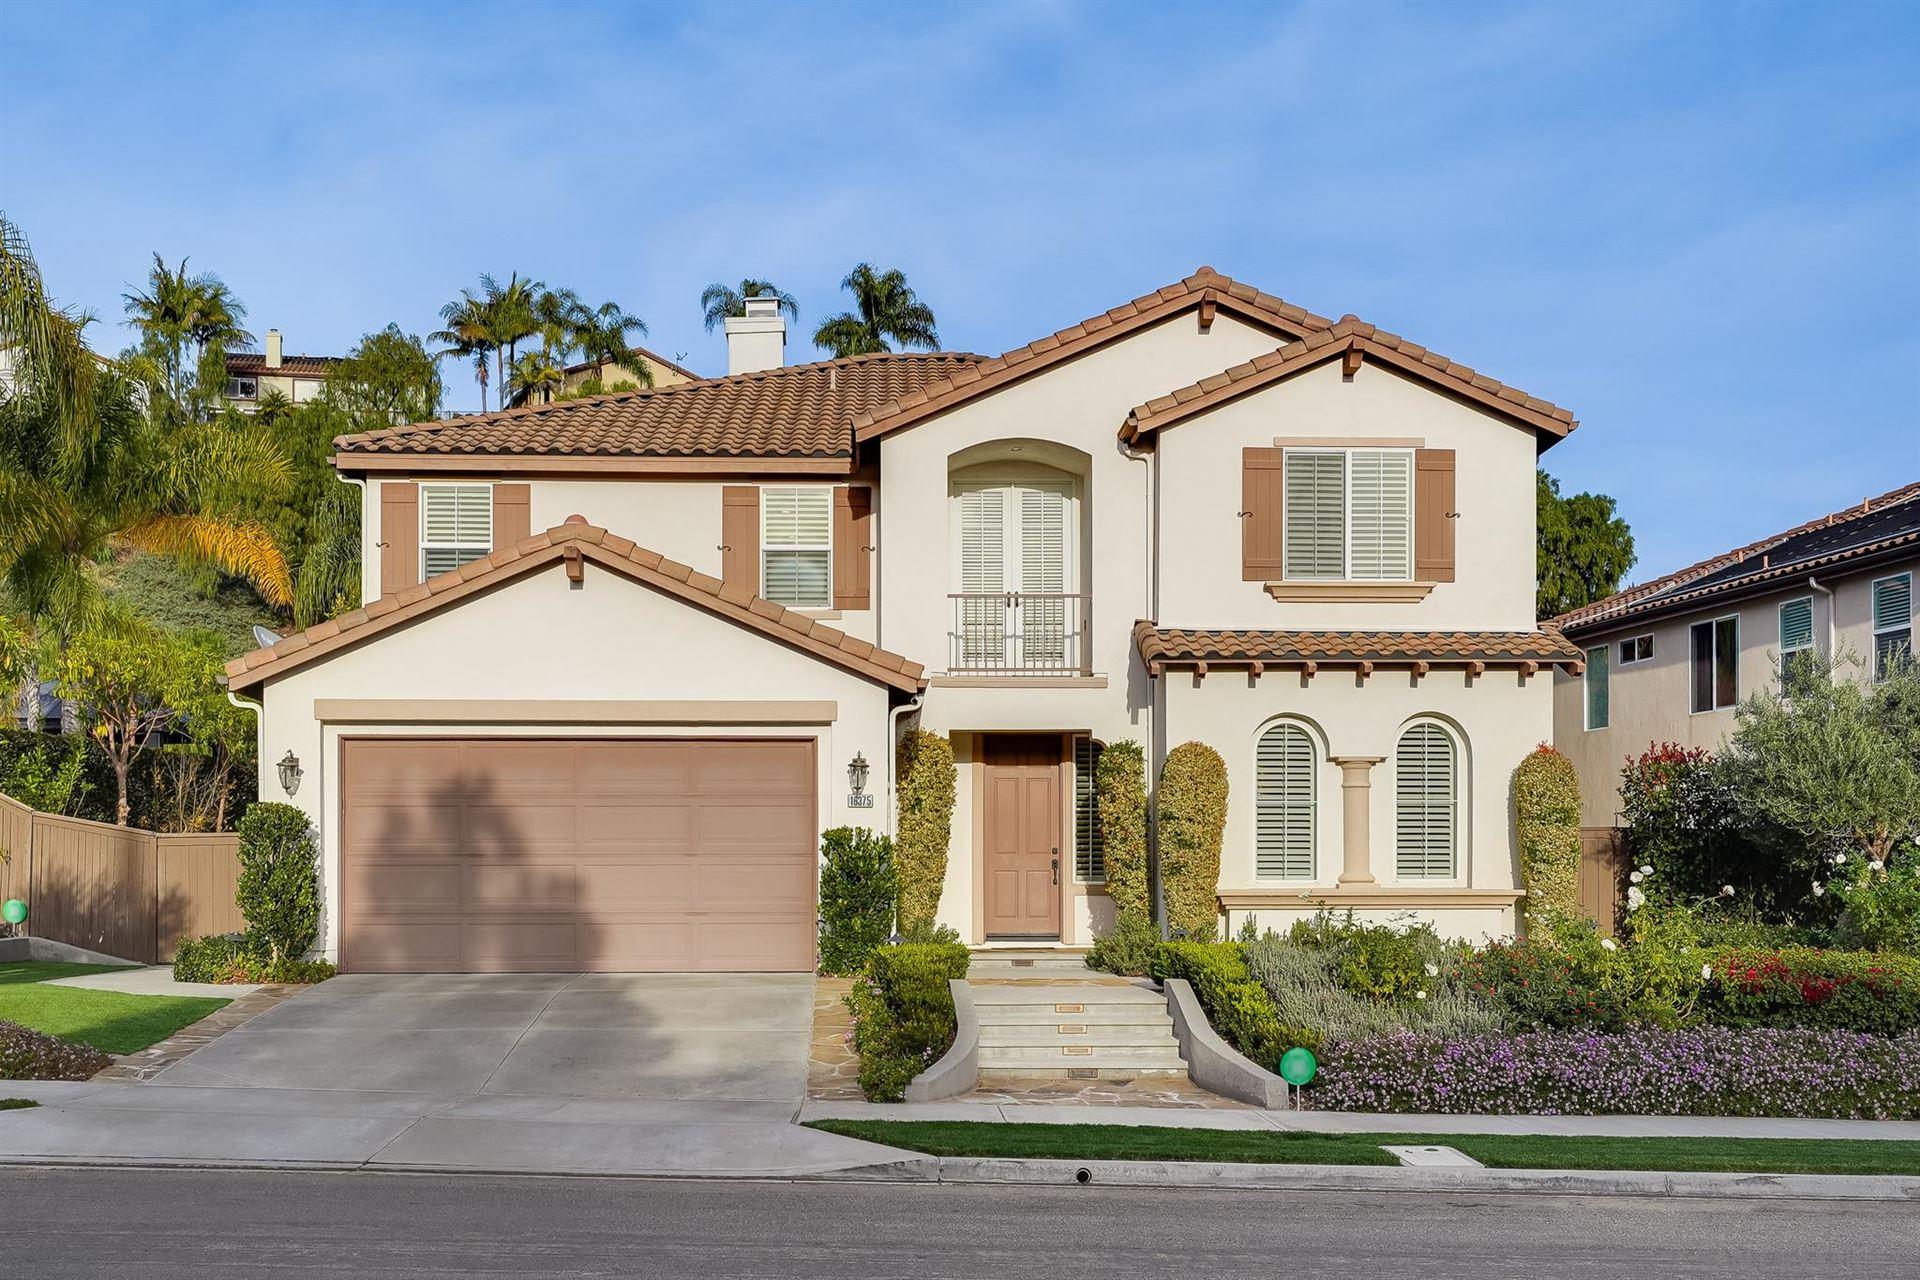 Photo of 16375 Cayenne Ridge Rd., San Diego, CA 92127 (MLS # 210001162)